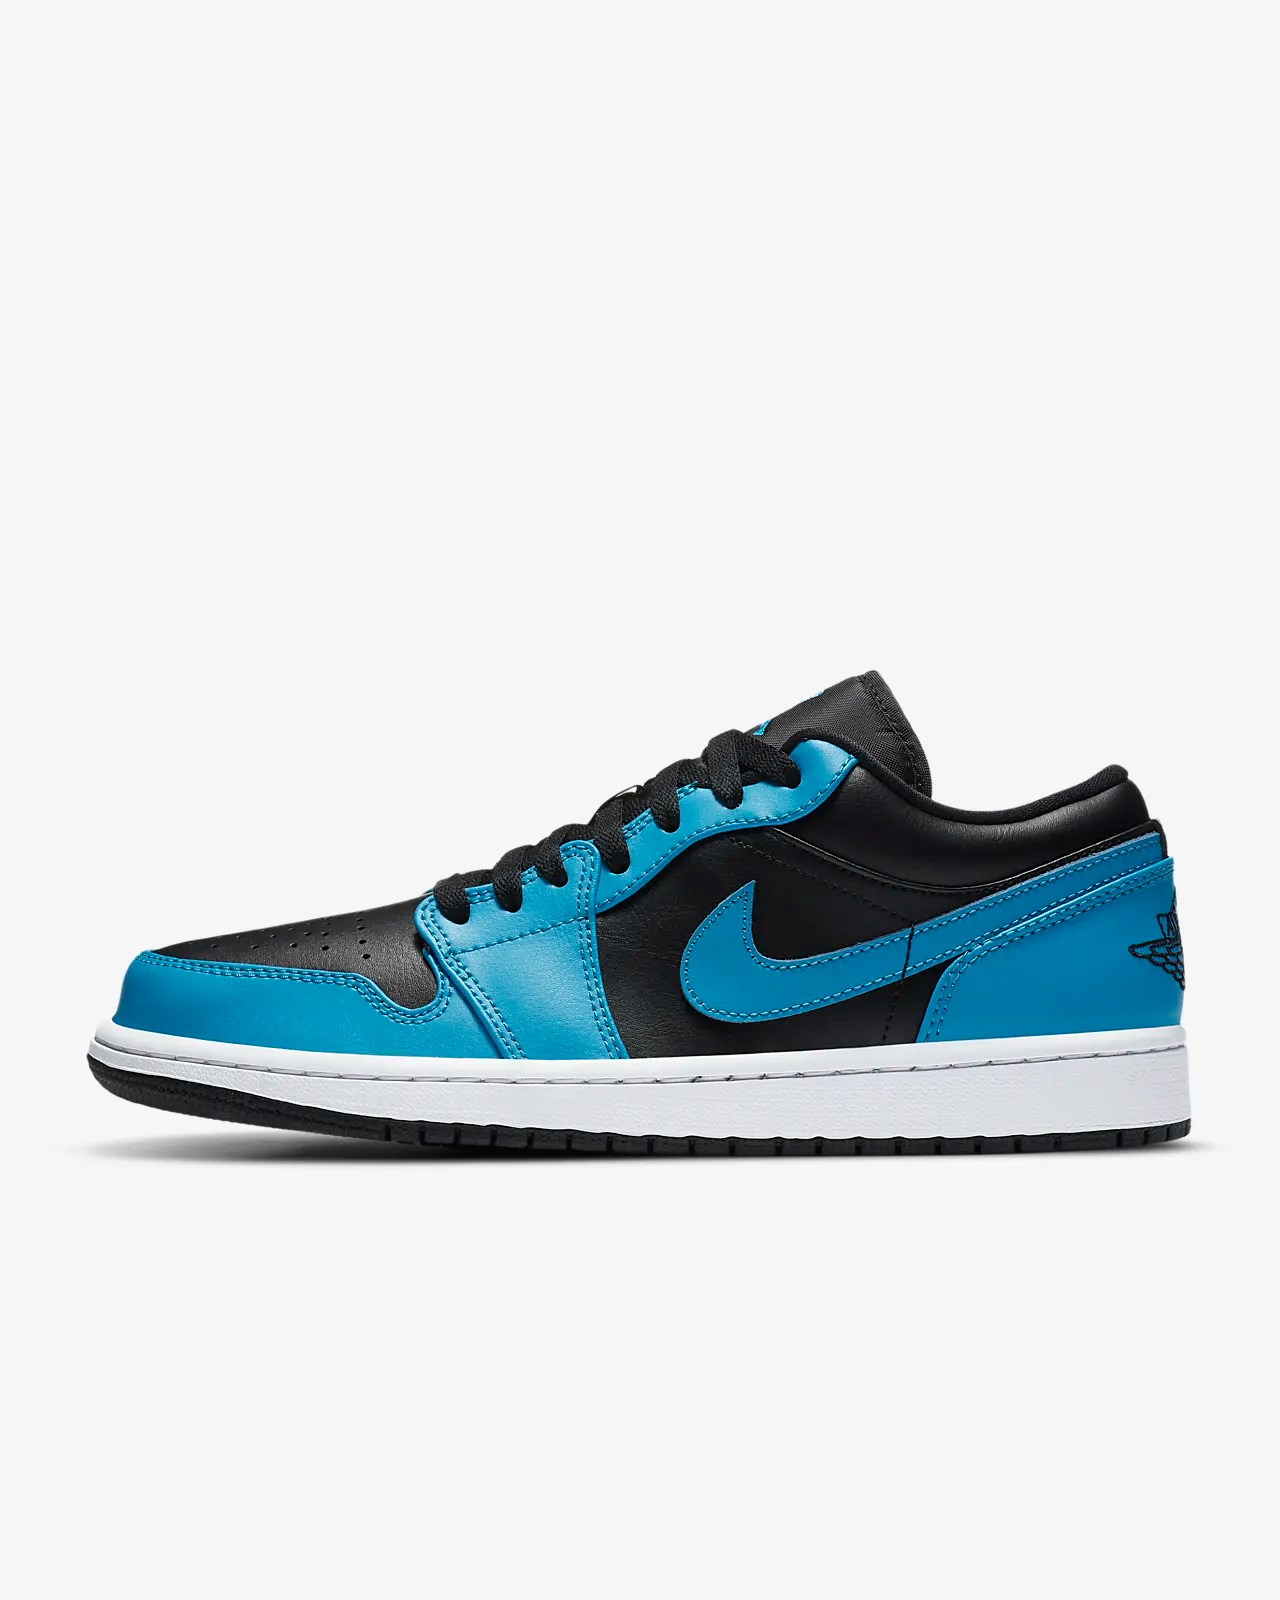 Air Jordan 1 低筒鞋款。Nike TW